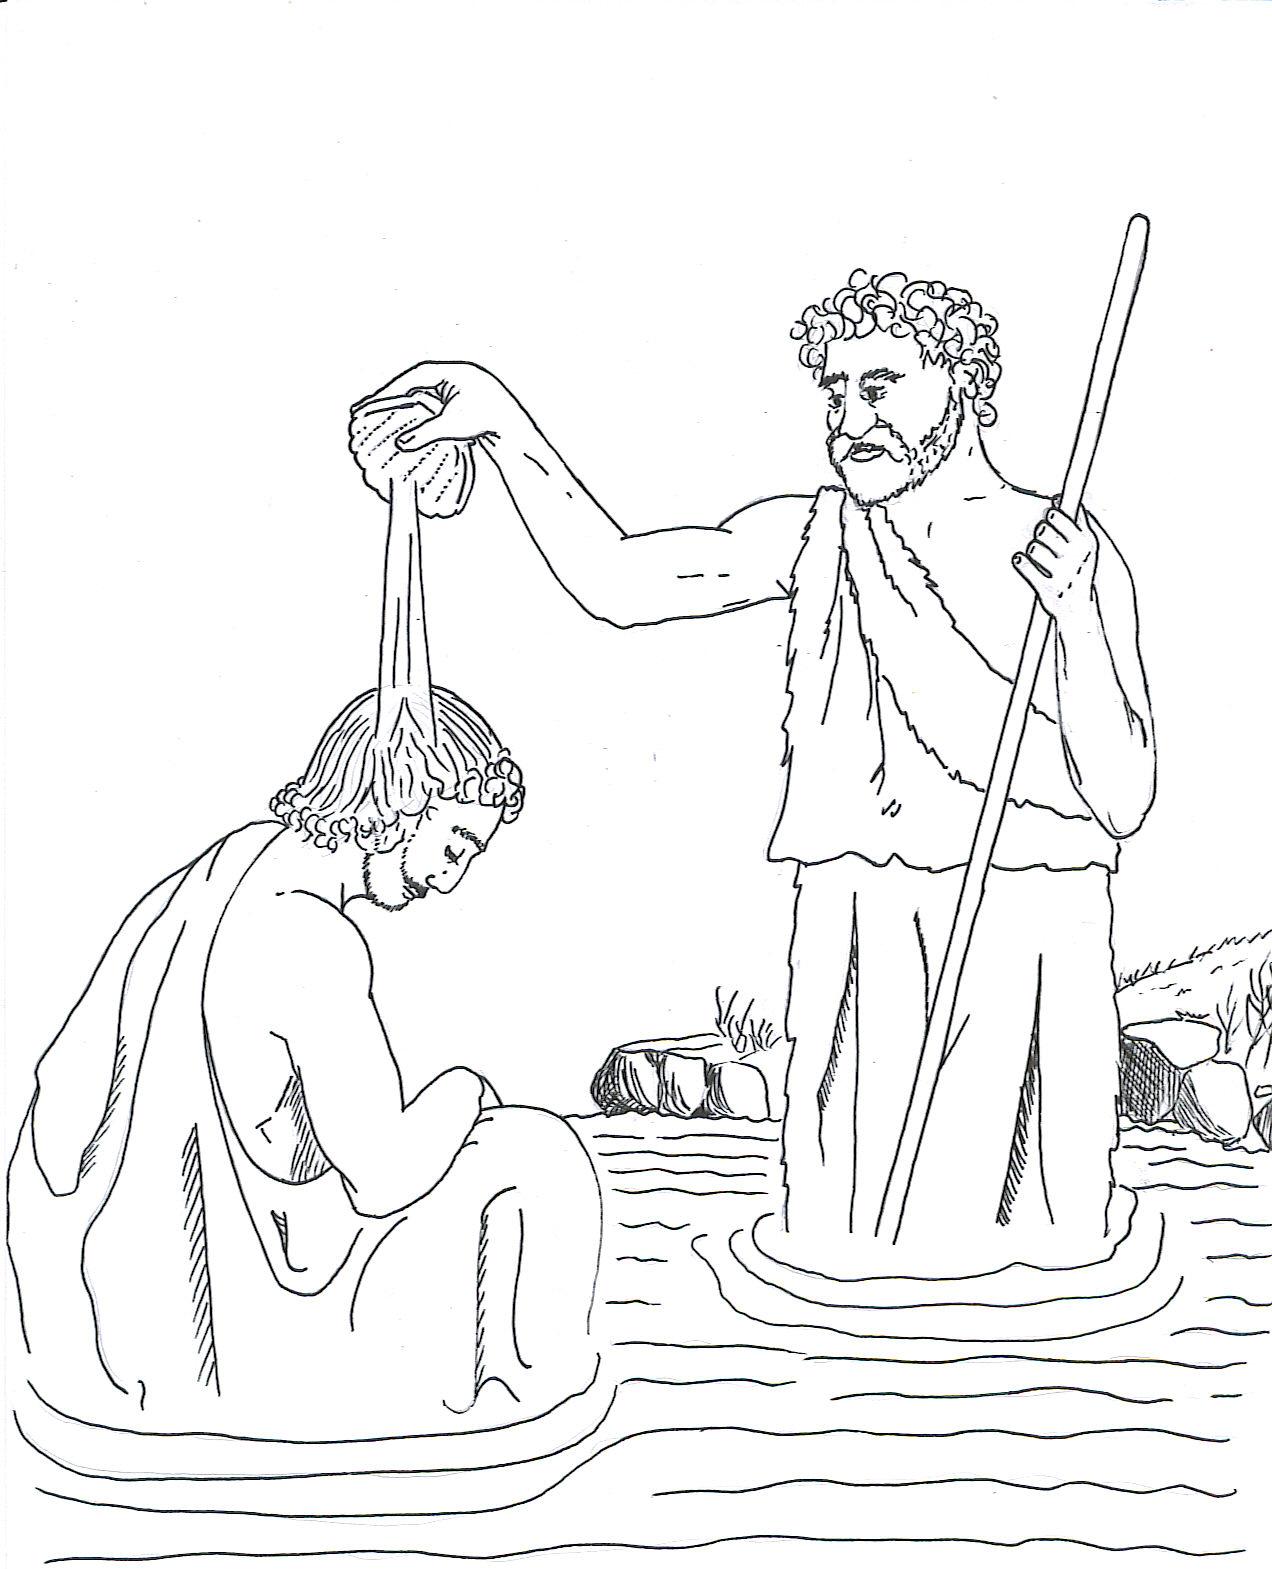 St. John Baptizing with Water Ink